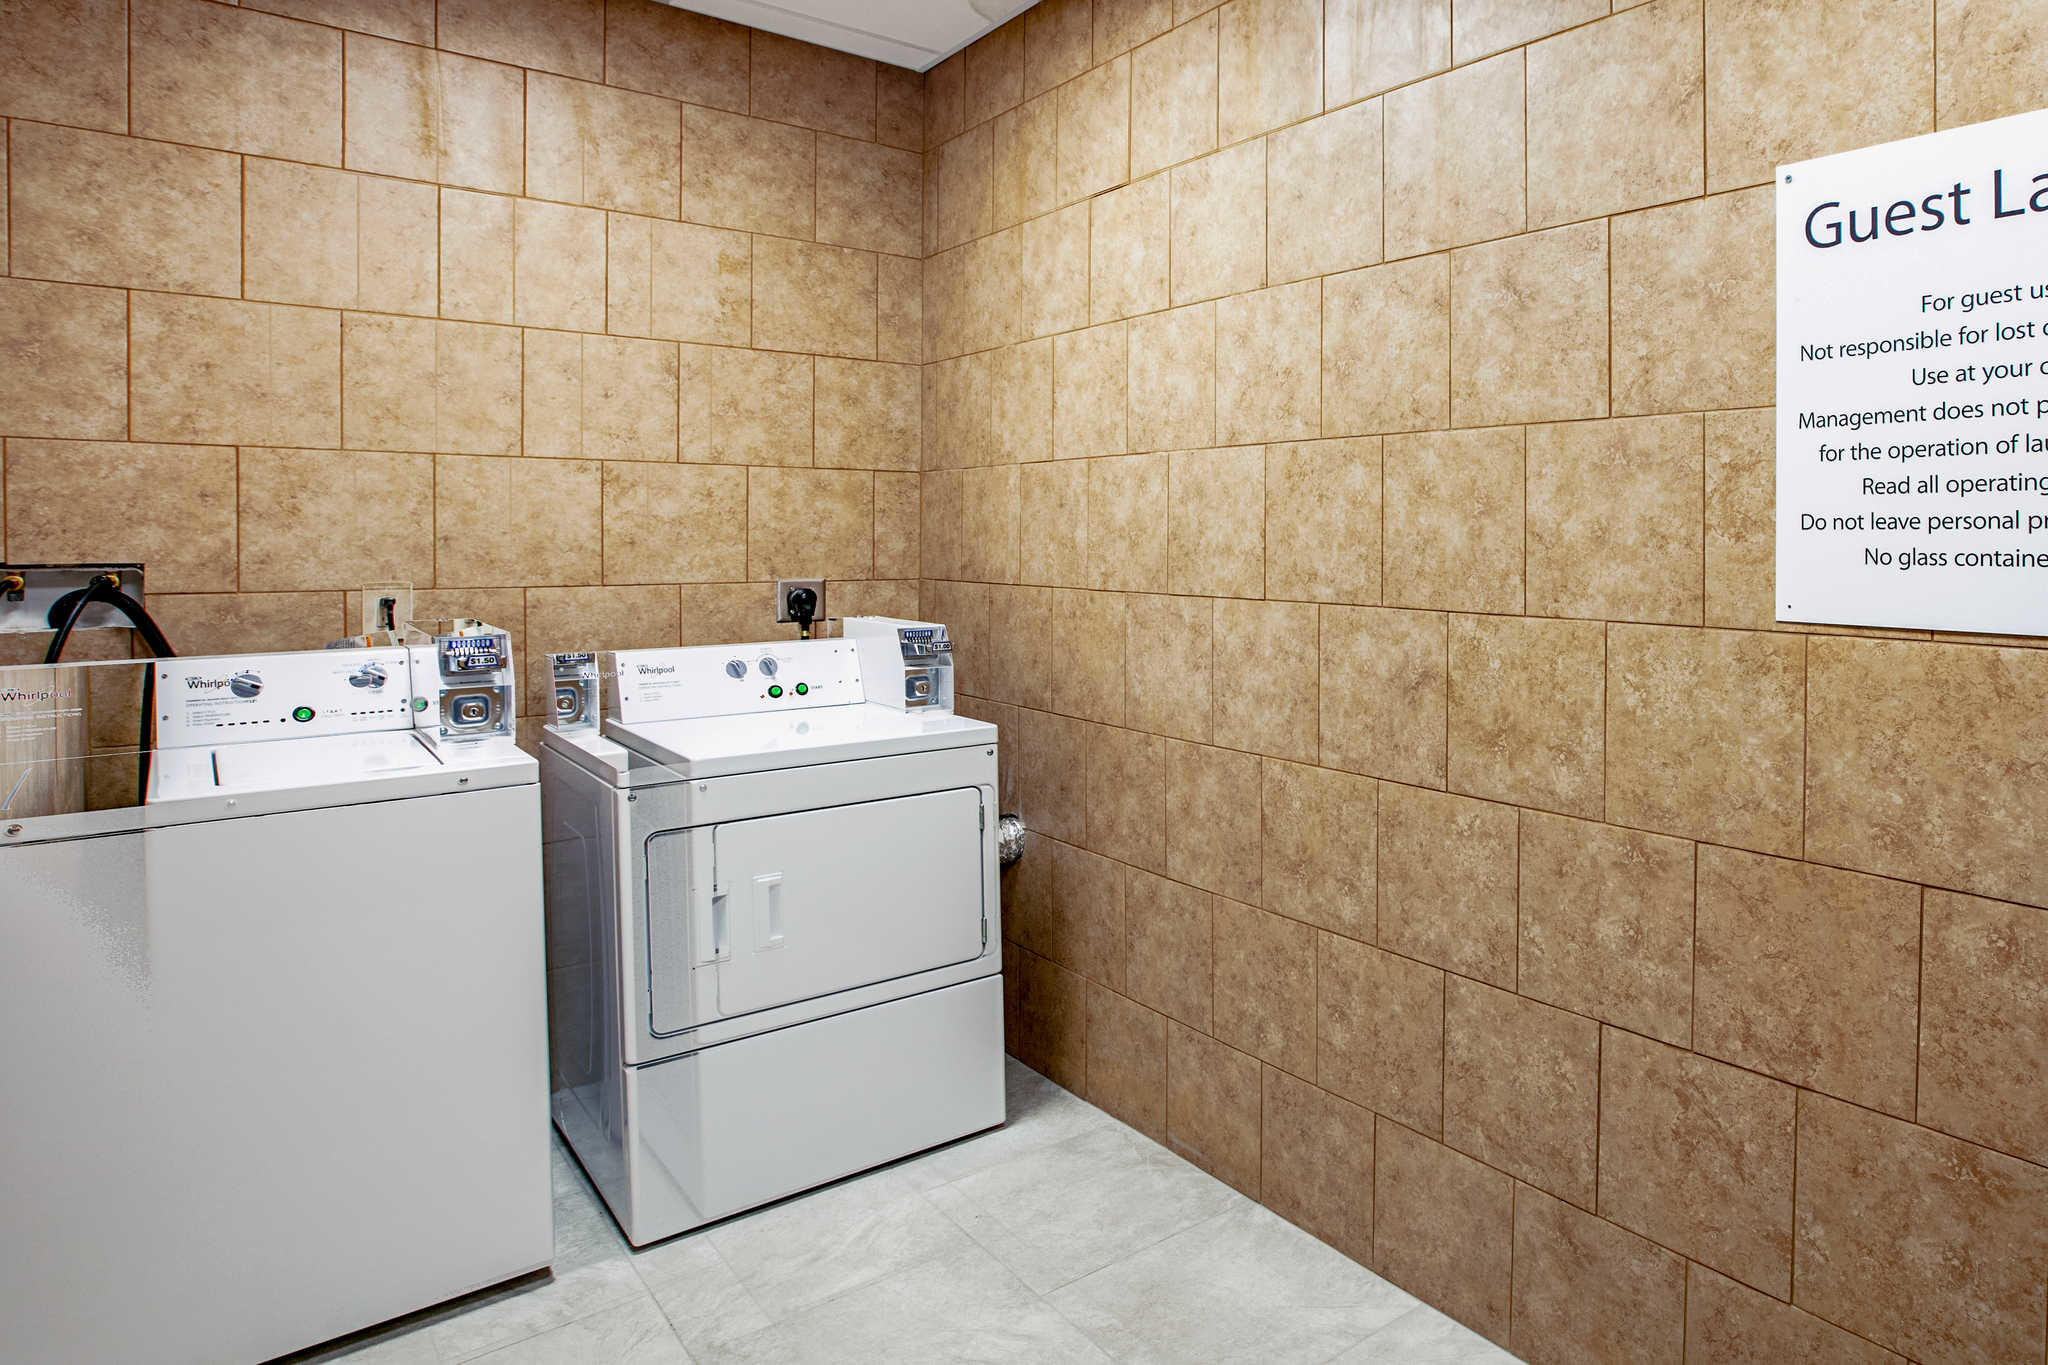 Comfort Suites image 49